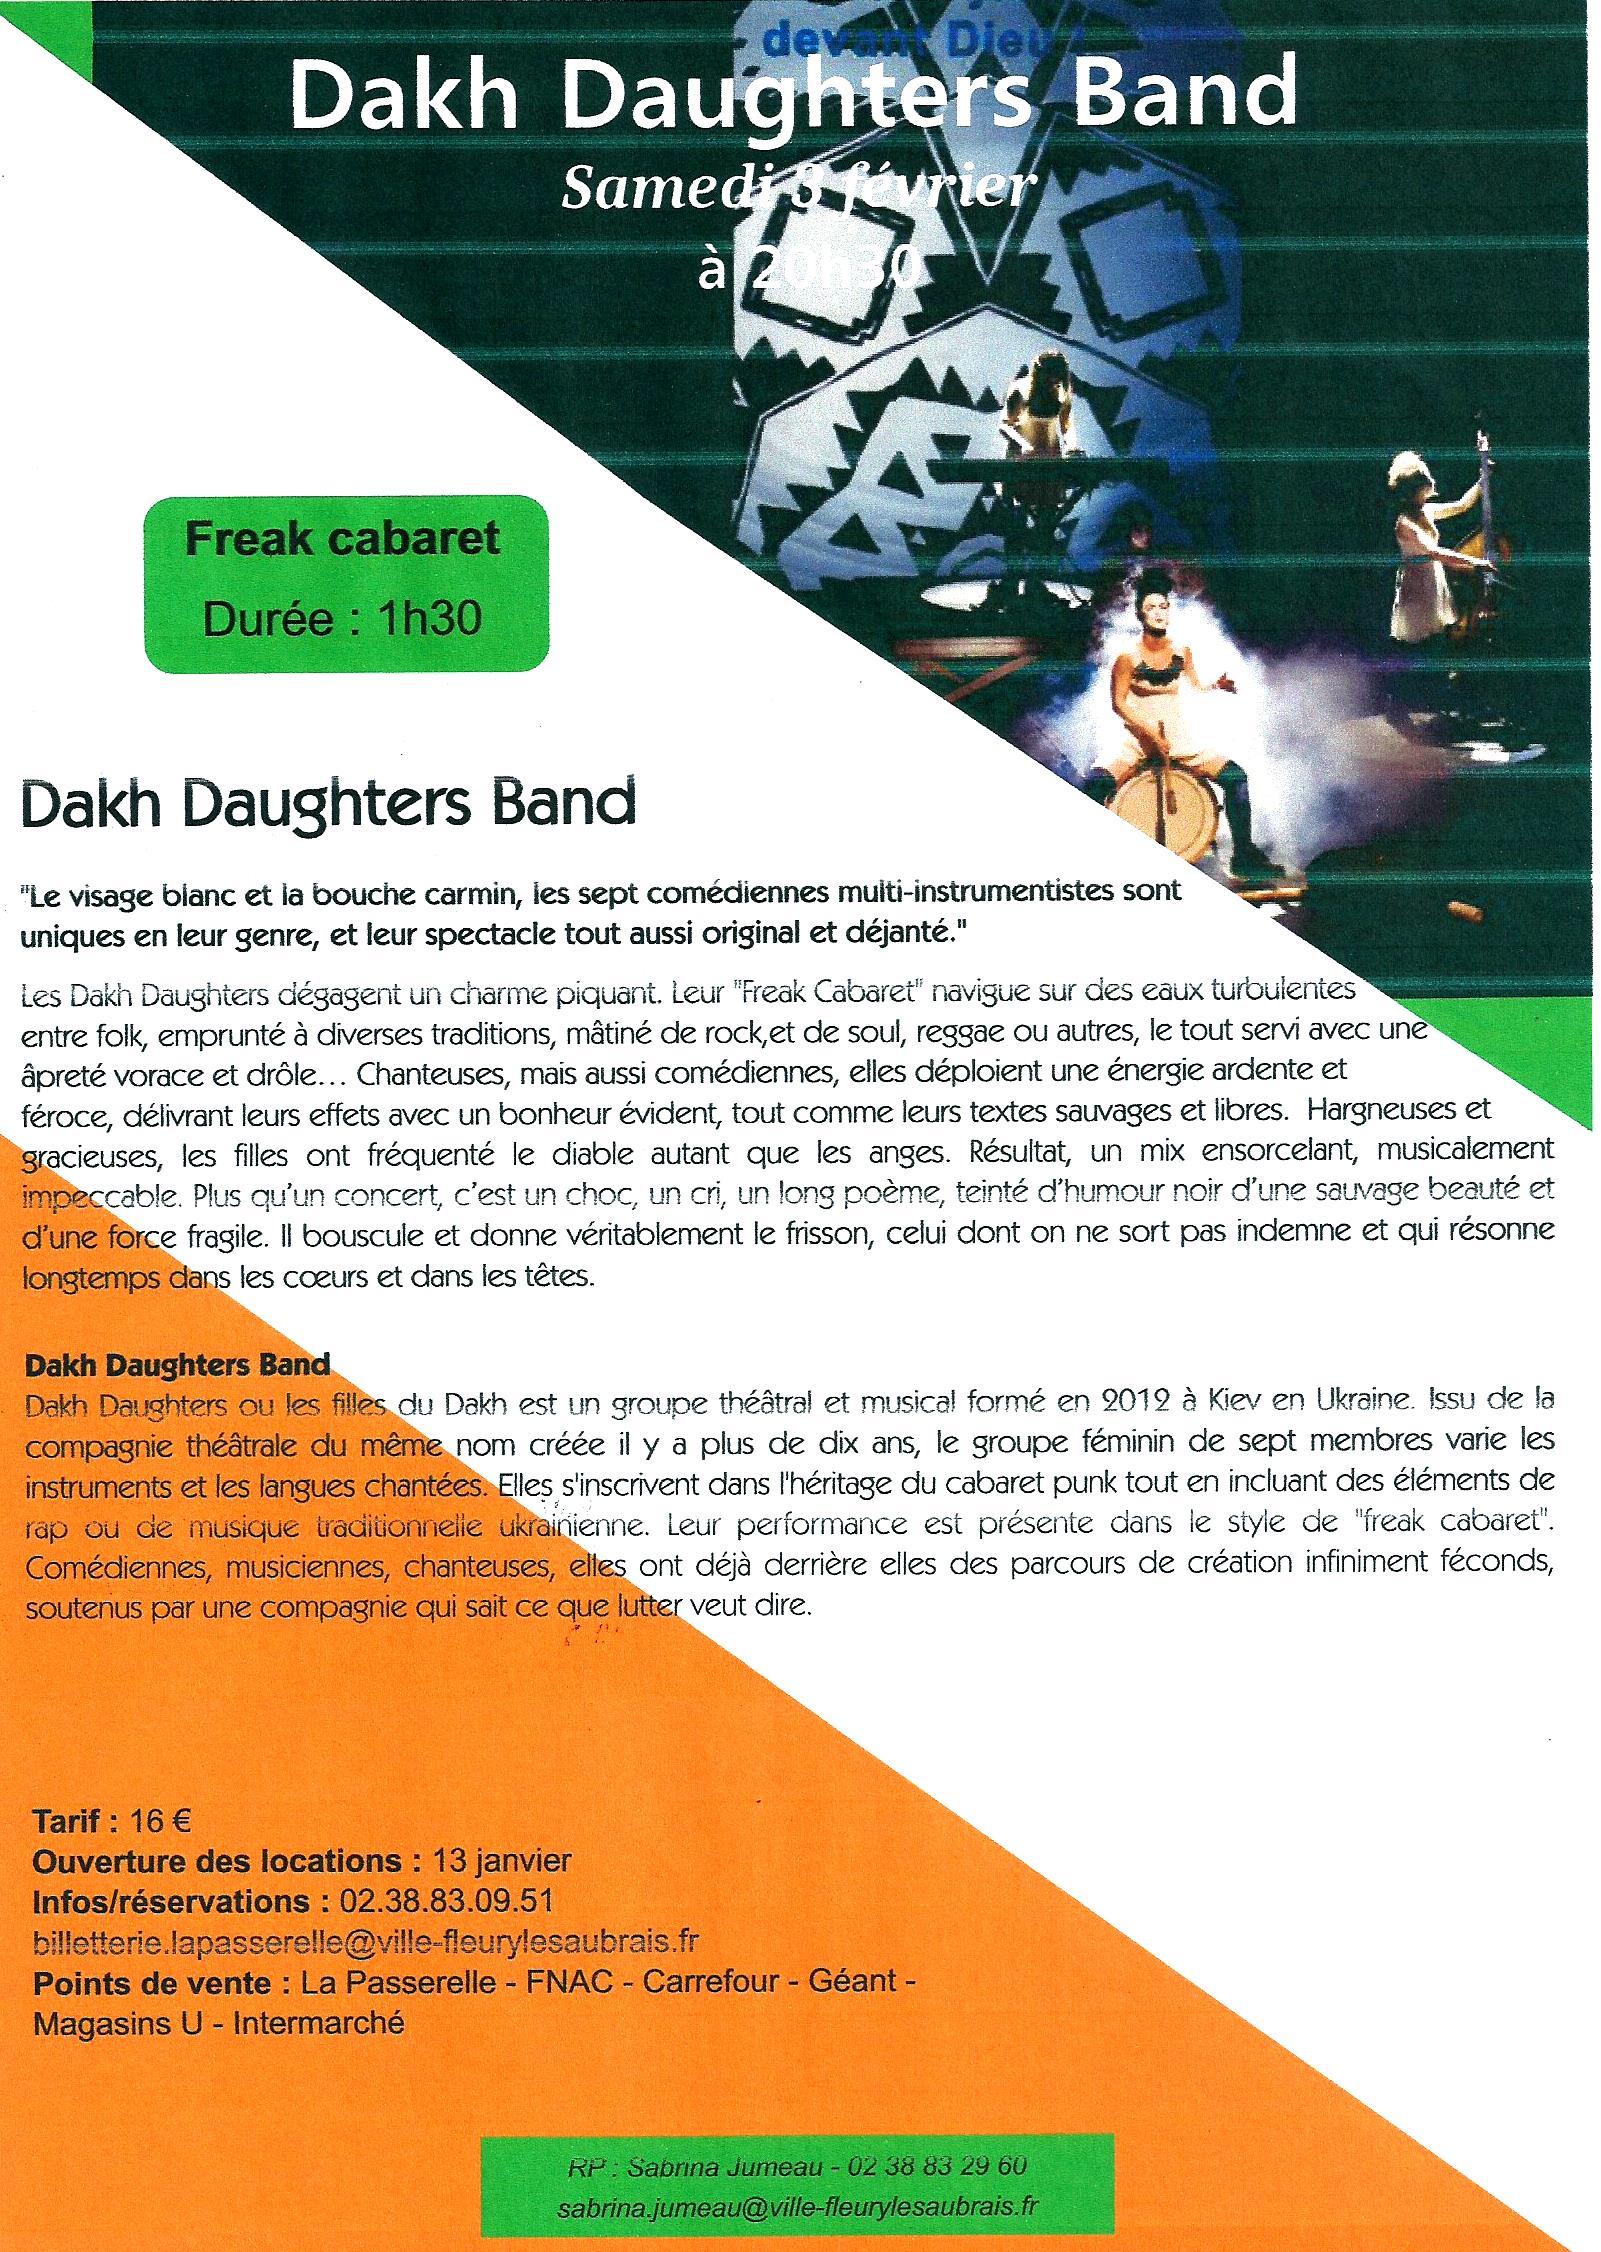 Scan Affiche La Passerelle 2018 Dakh Daughters Band (03.02.jpg